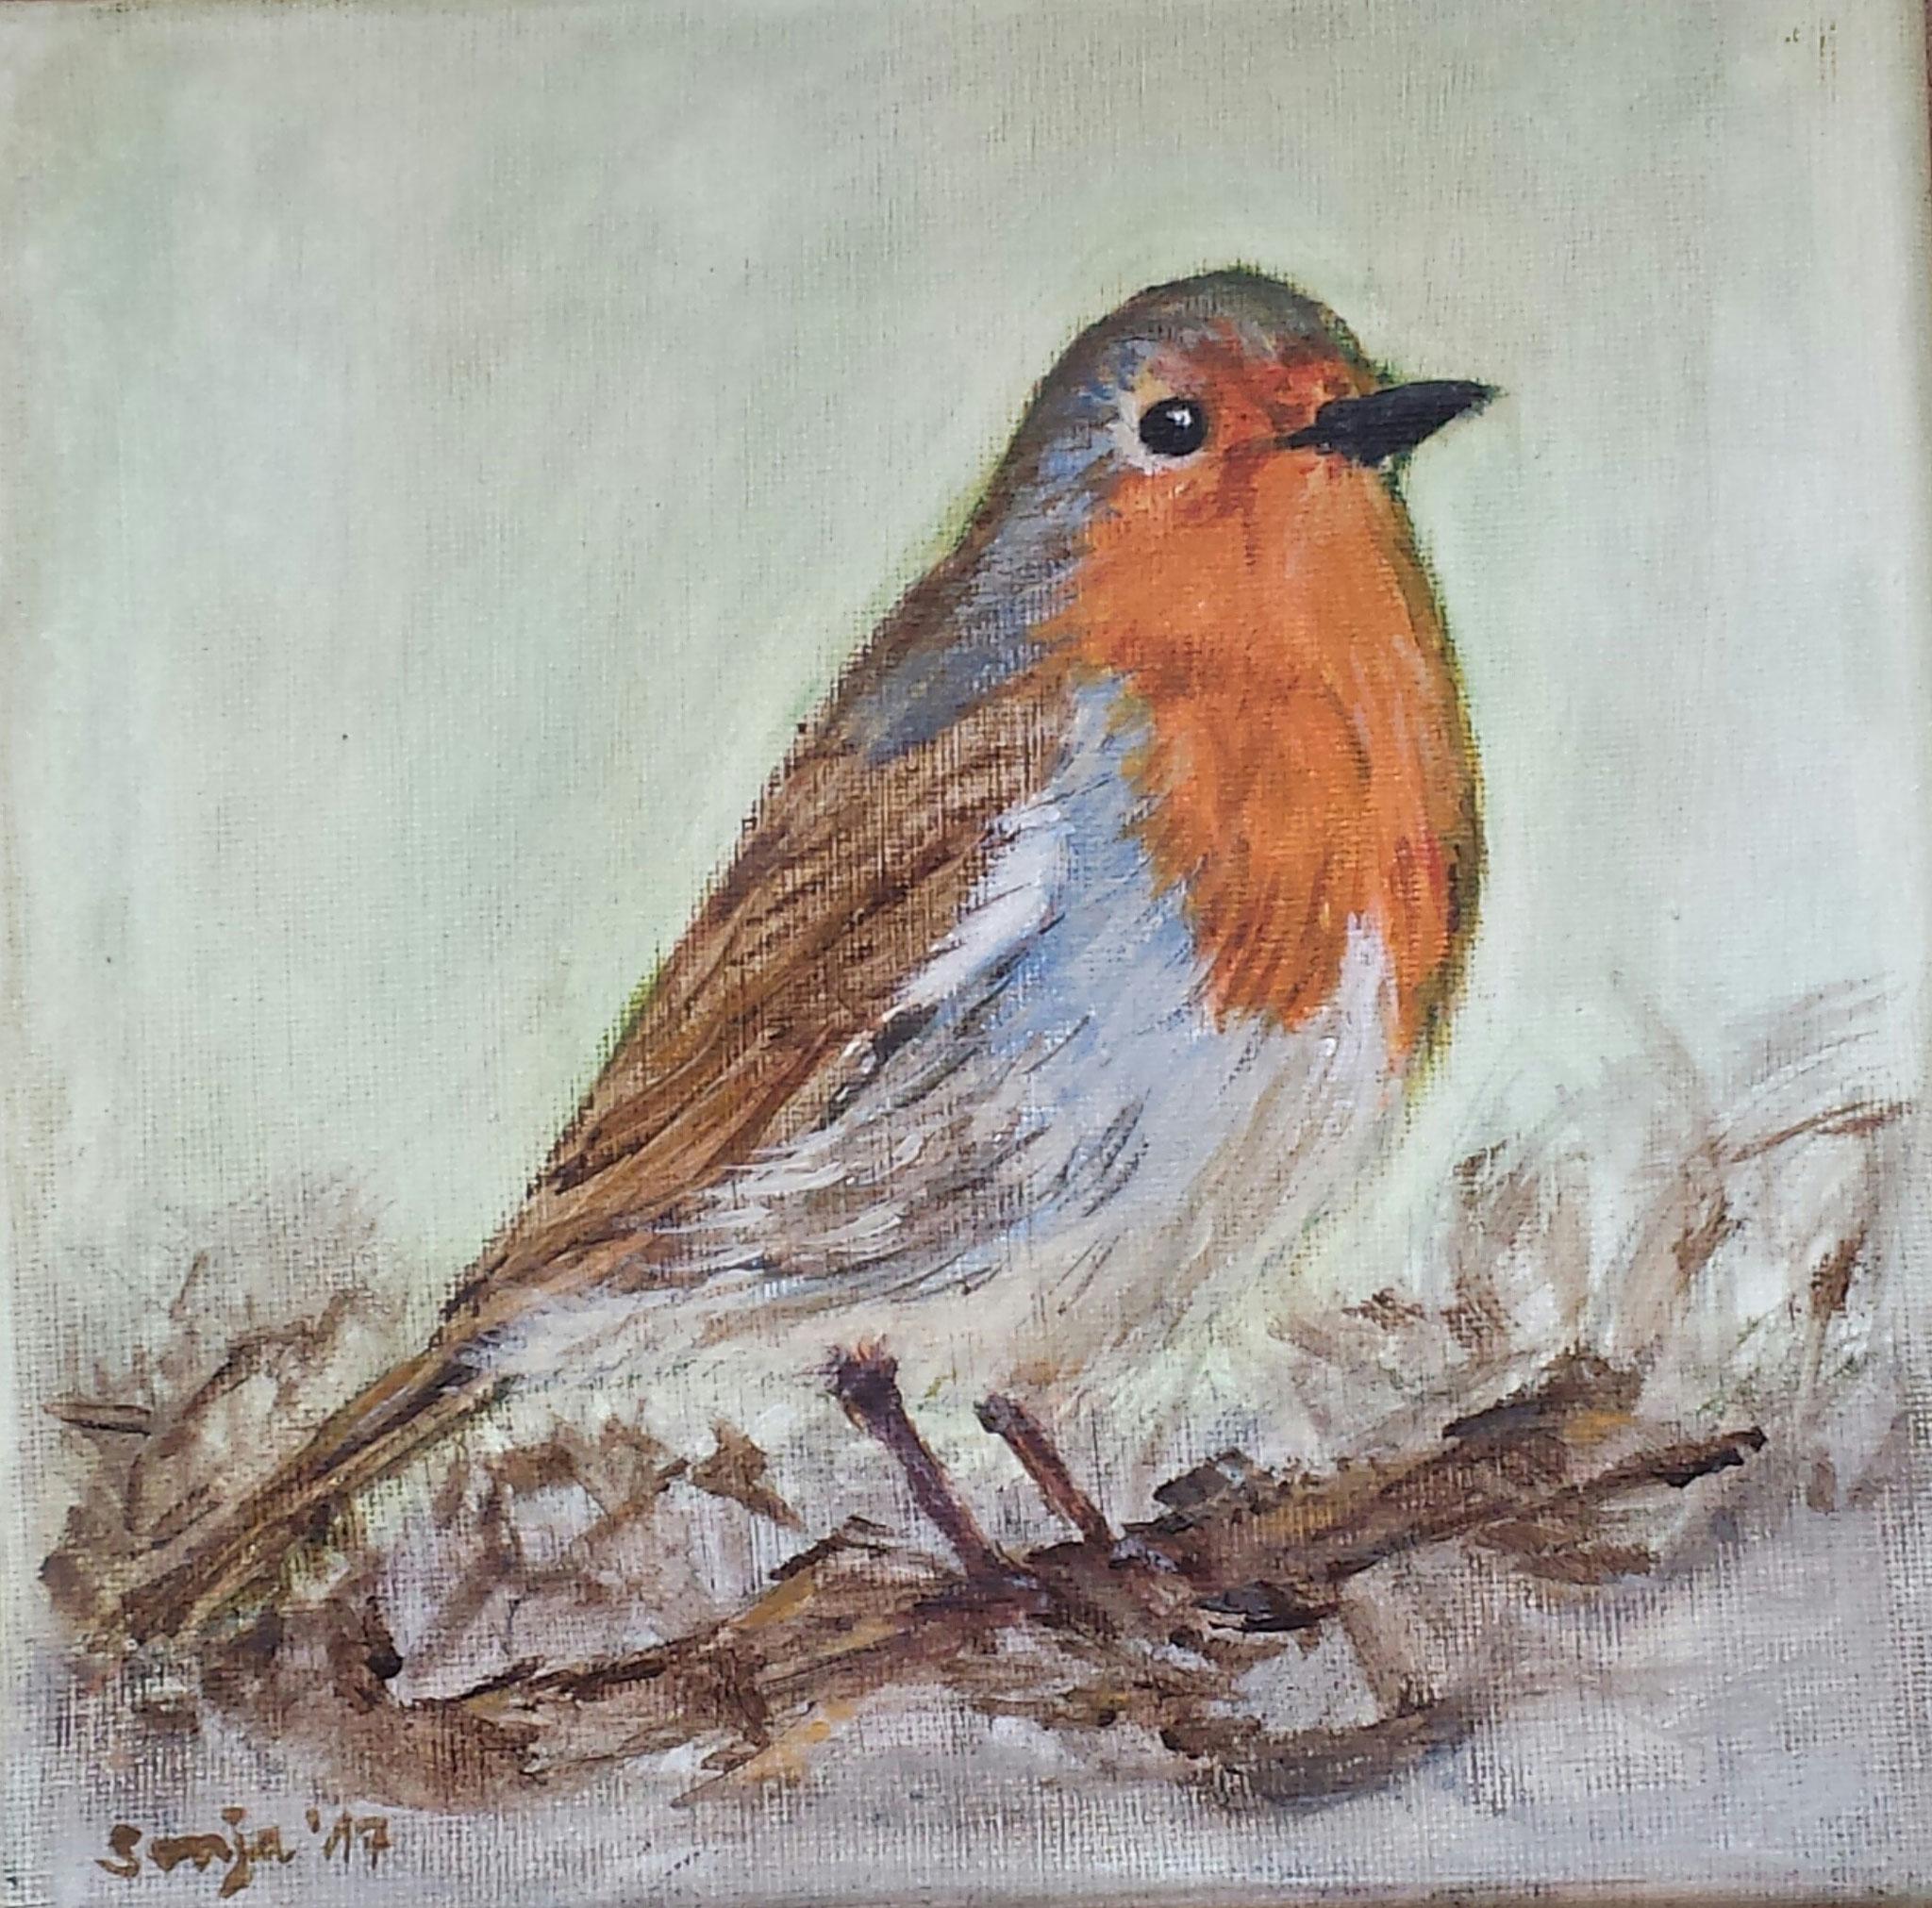 """Gelis Rotkehlchen"", Acryl auf Leinwand, 20 x 20 cm"